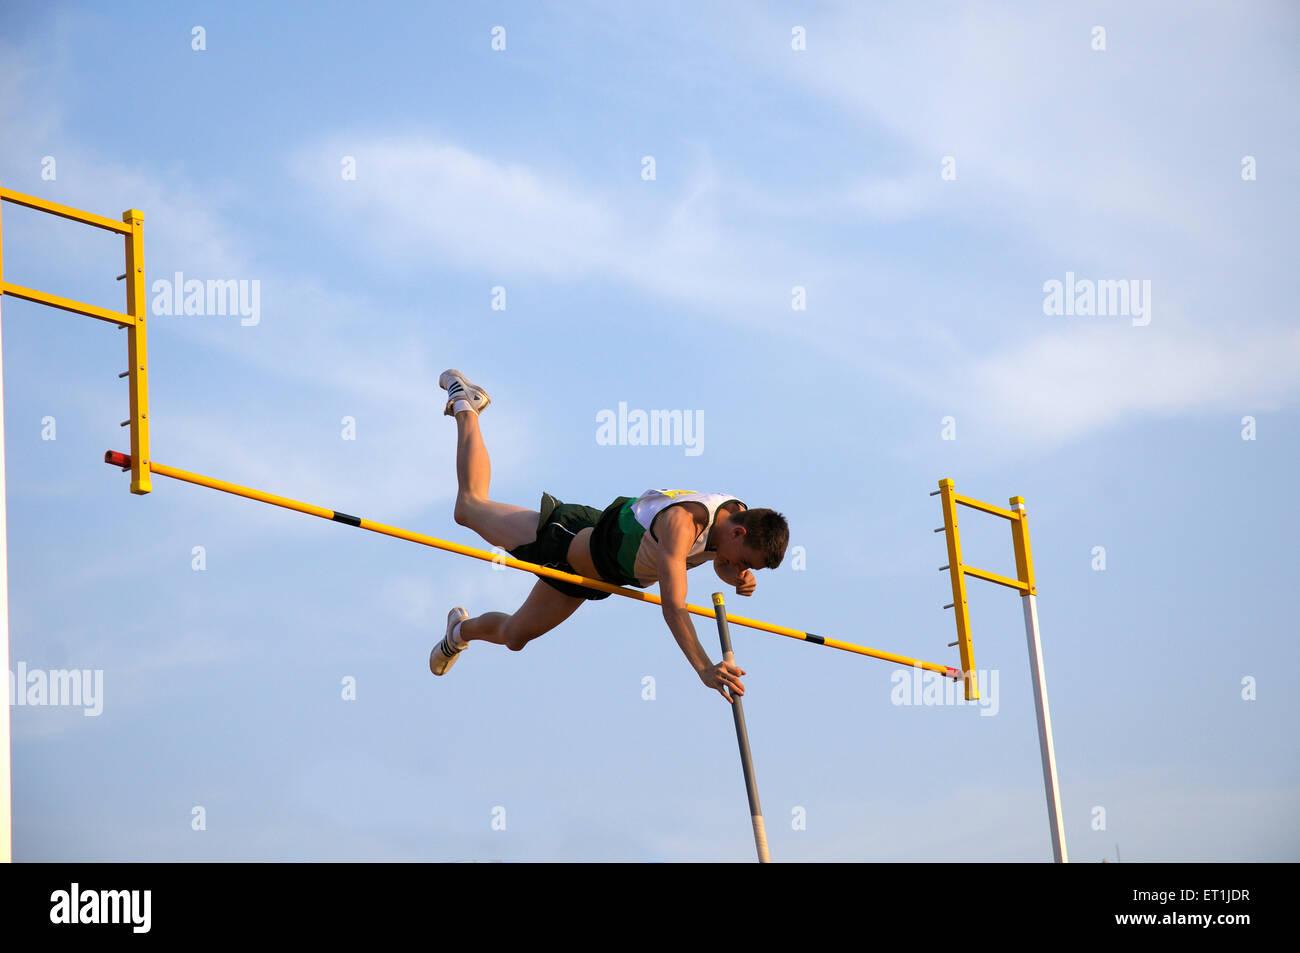 Athlete attempting pole vault jump ; Pune ; Maharashtra ; India 15 October 2008 NOMR - Stock Image